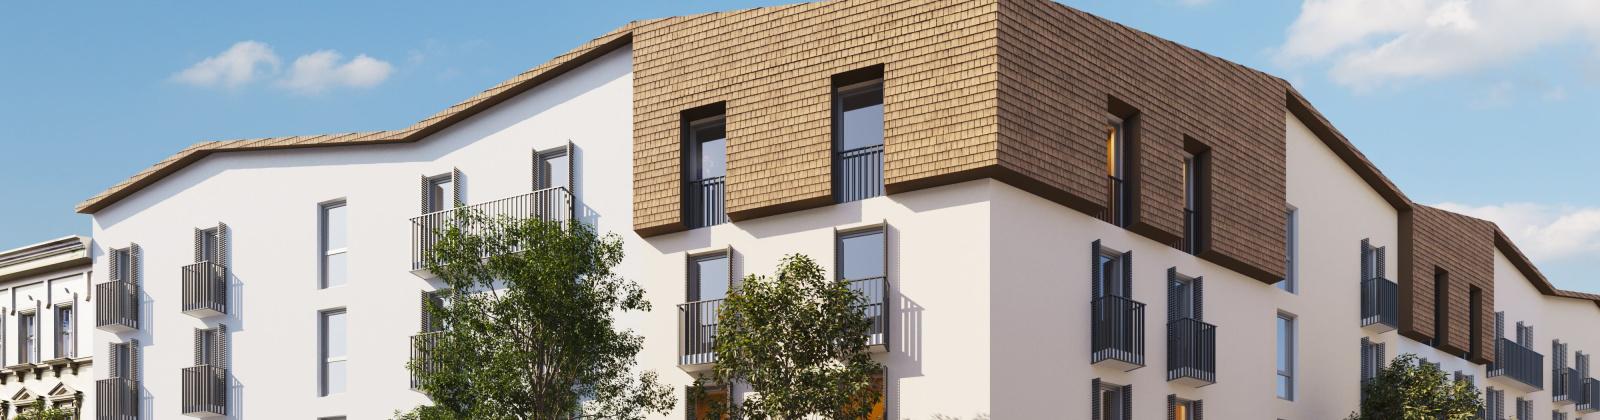 CARREROT, PAU, France 64000, 3 Chambres Chambres, ,1 Salle de bainsSalle de bain,Appartement,Appartement,CARREROT ,1362